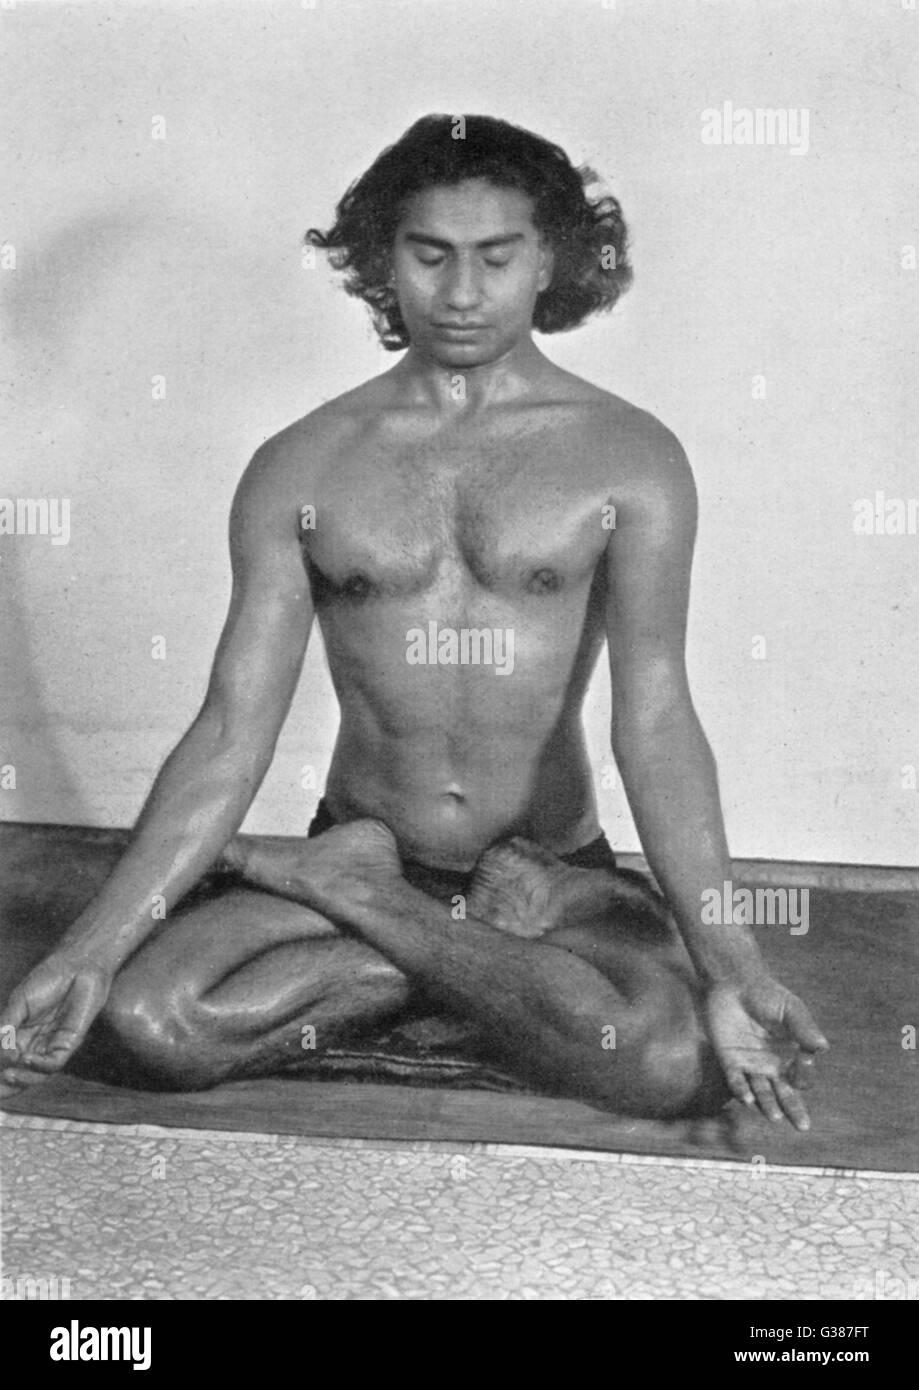 Yogi Vithaldas in the  PADMA-ASAN (Lotus pose), one of the meditative postures        Date: 1938 - Stock Image